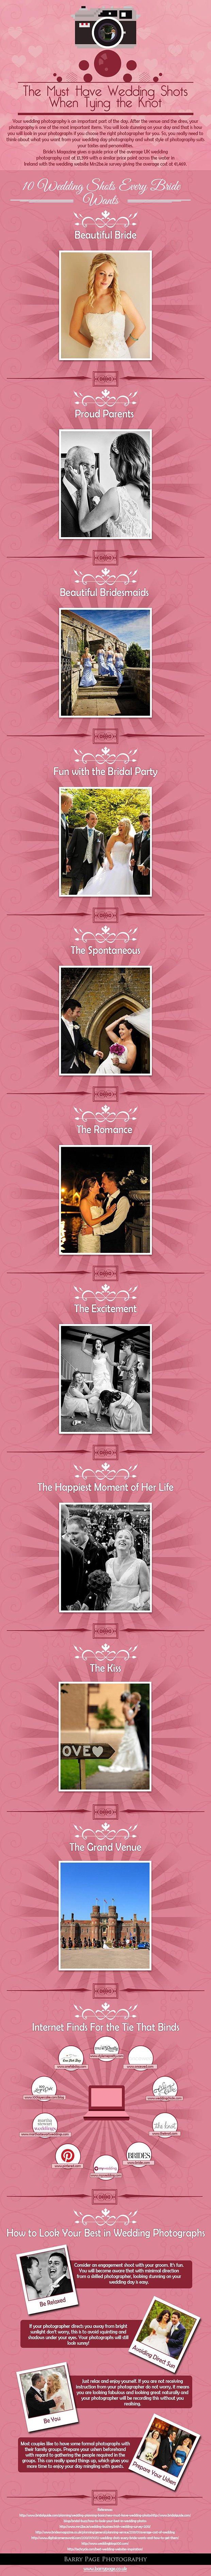 weddinginfographic1